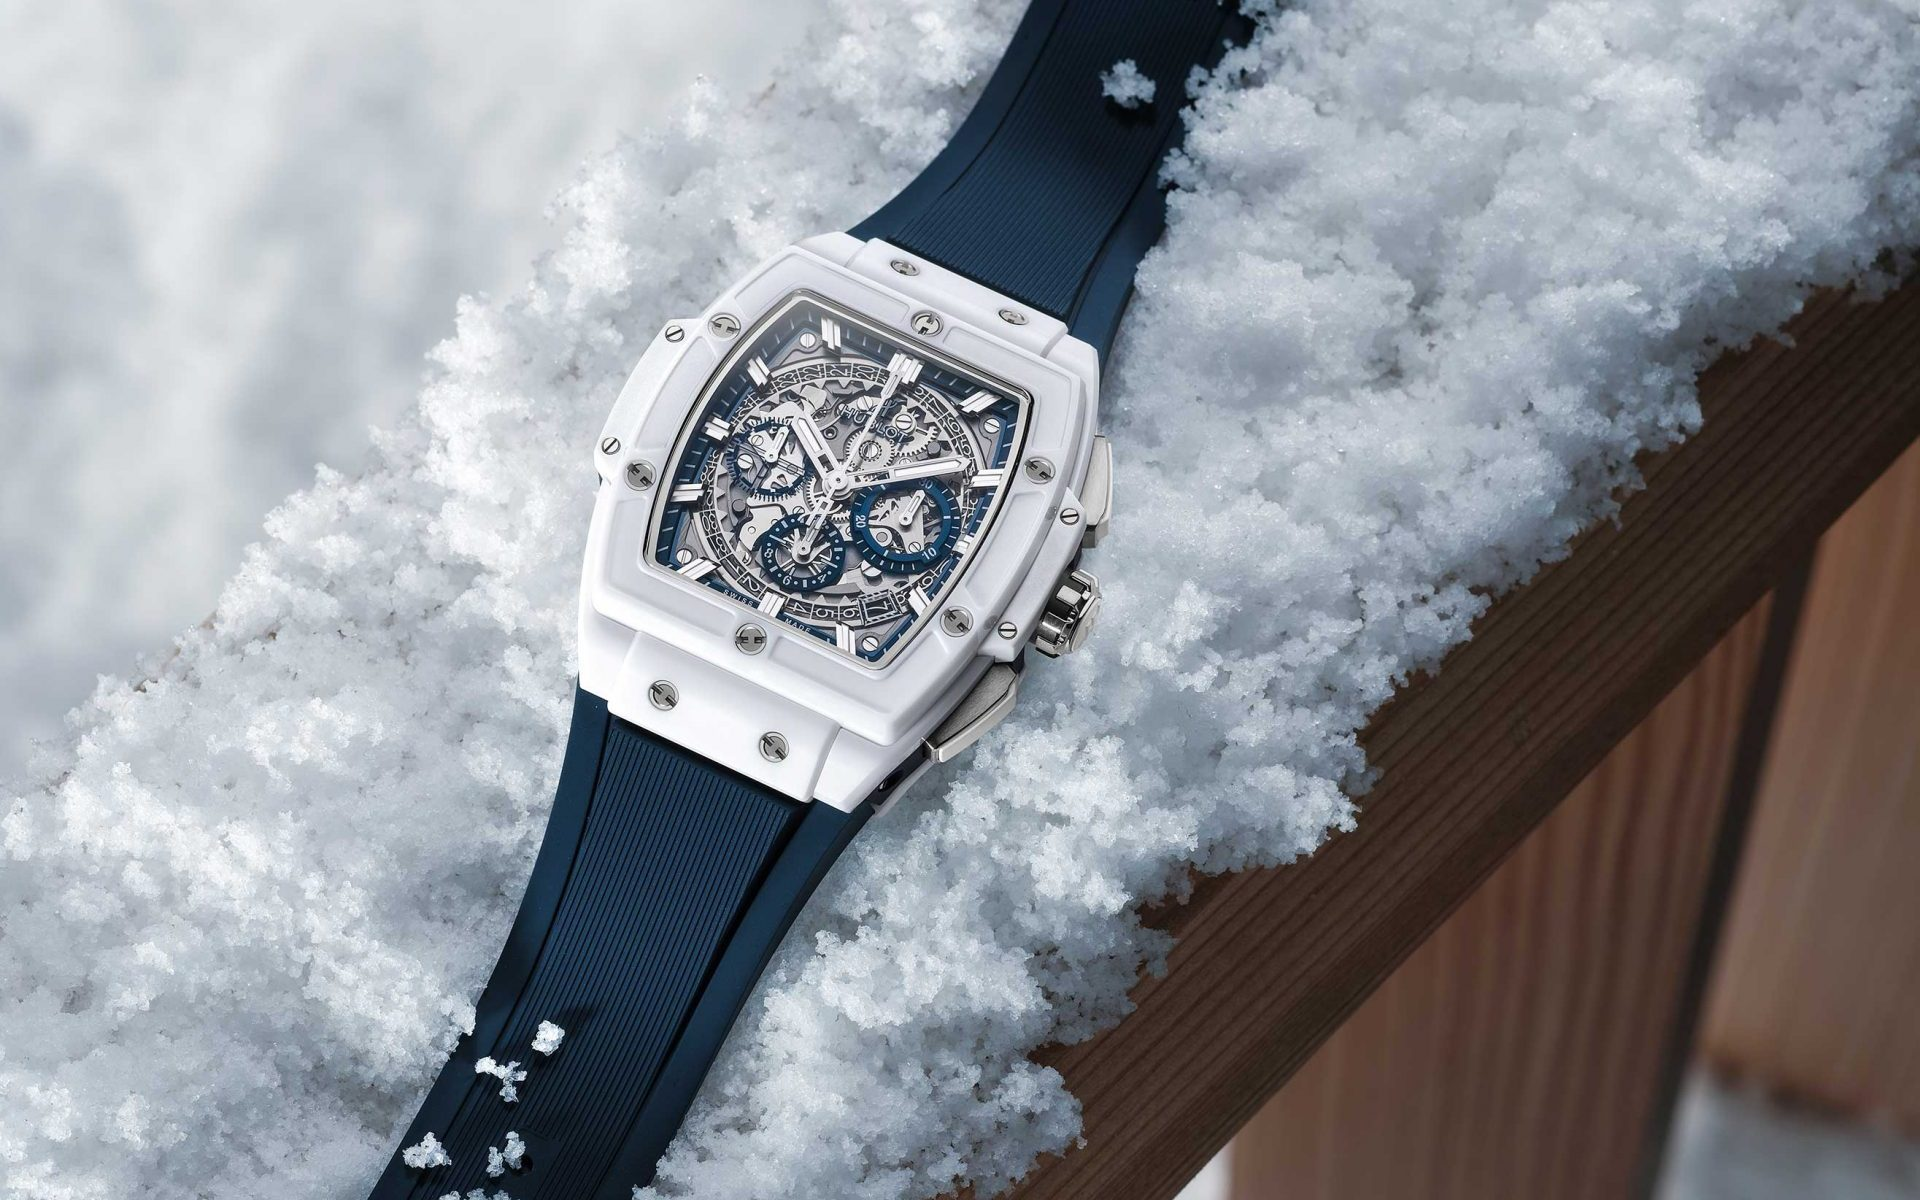 Hublot Spirit of Big Bang in the snow